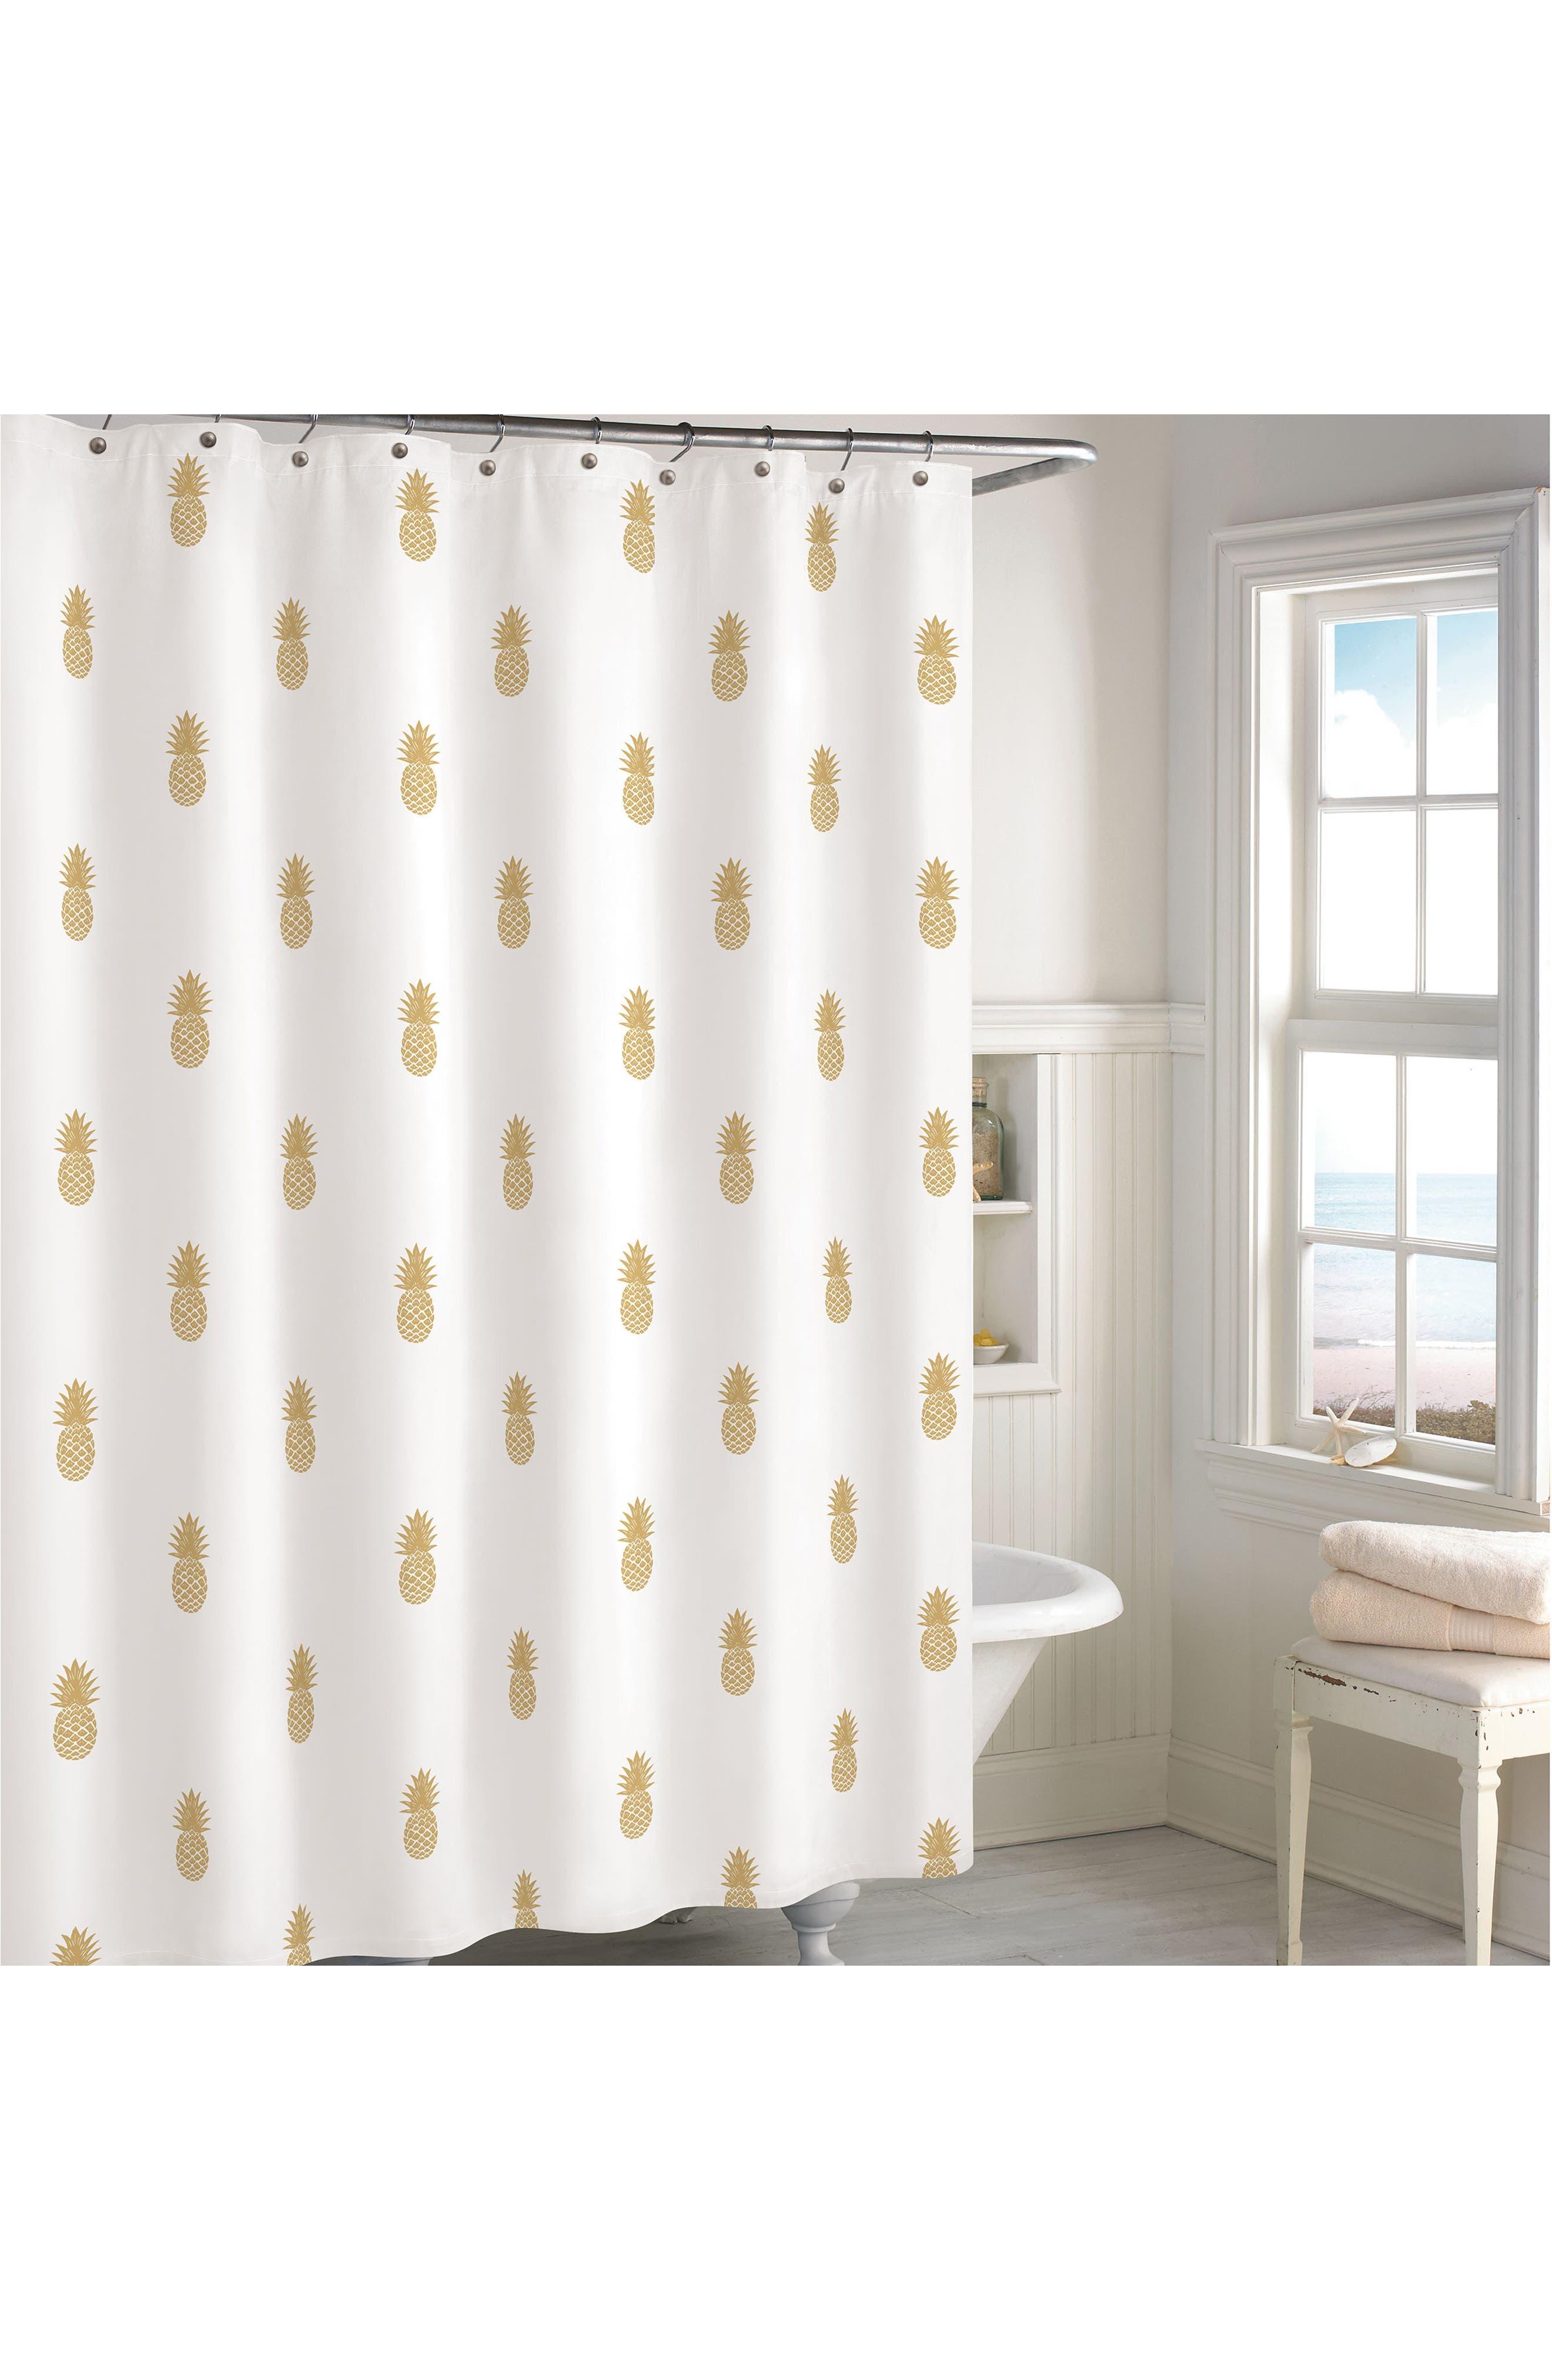 Main Image - Destinations Golden Pineapple Shower Curtain